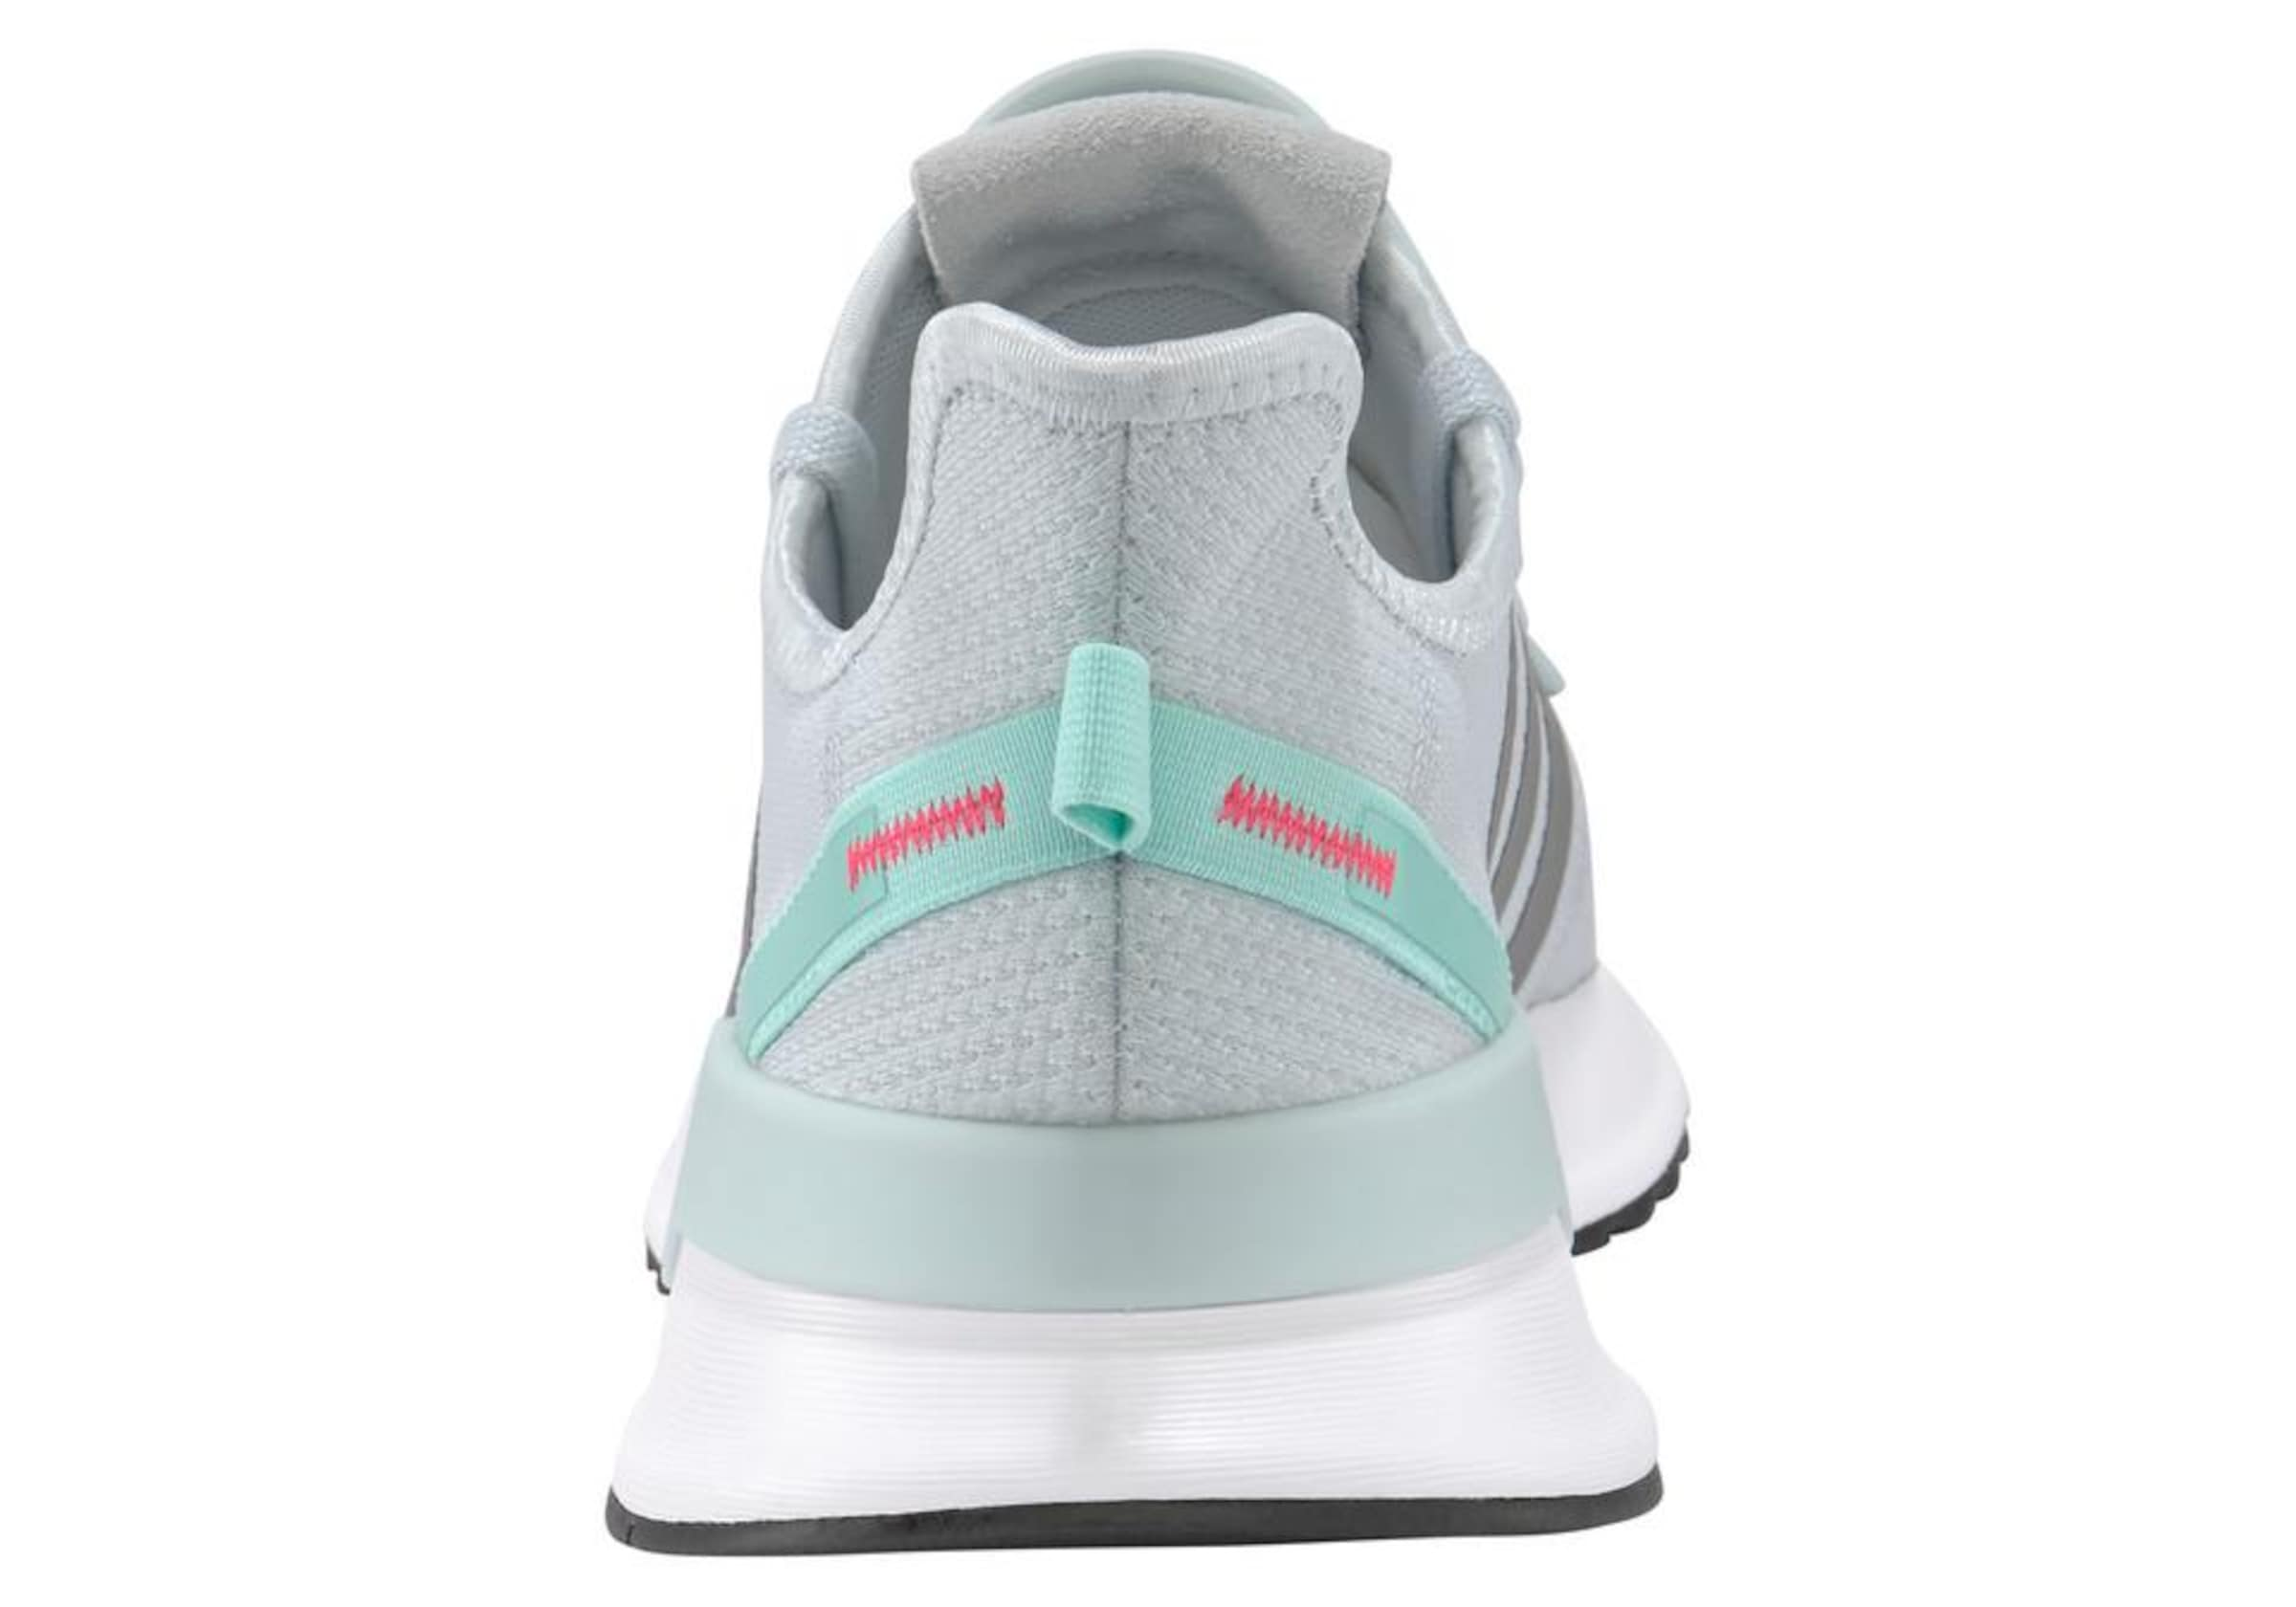 Sneaker In 'u Adidas Grau Run' Originals path OpalAqua e9IHW2YEbD